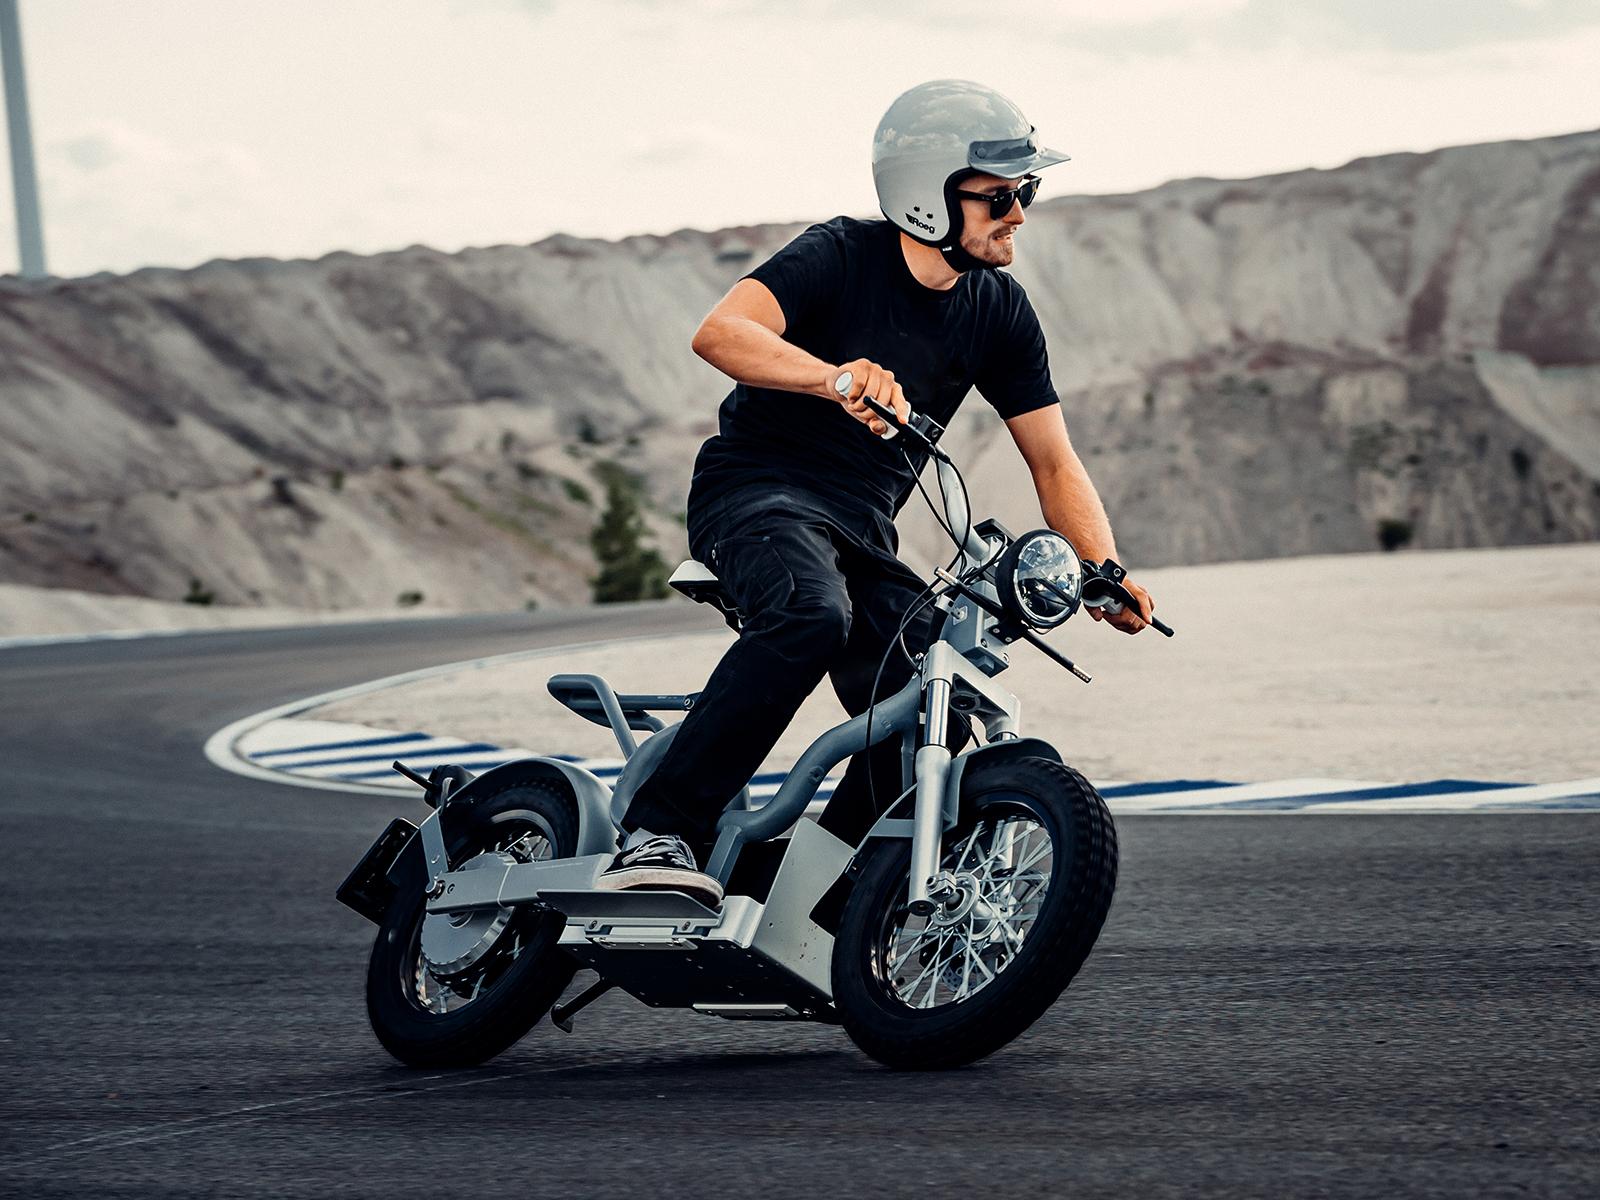 A man rides a Cake Makka moped along a race track